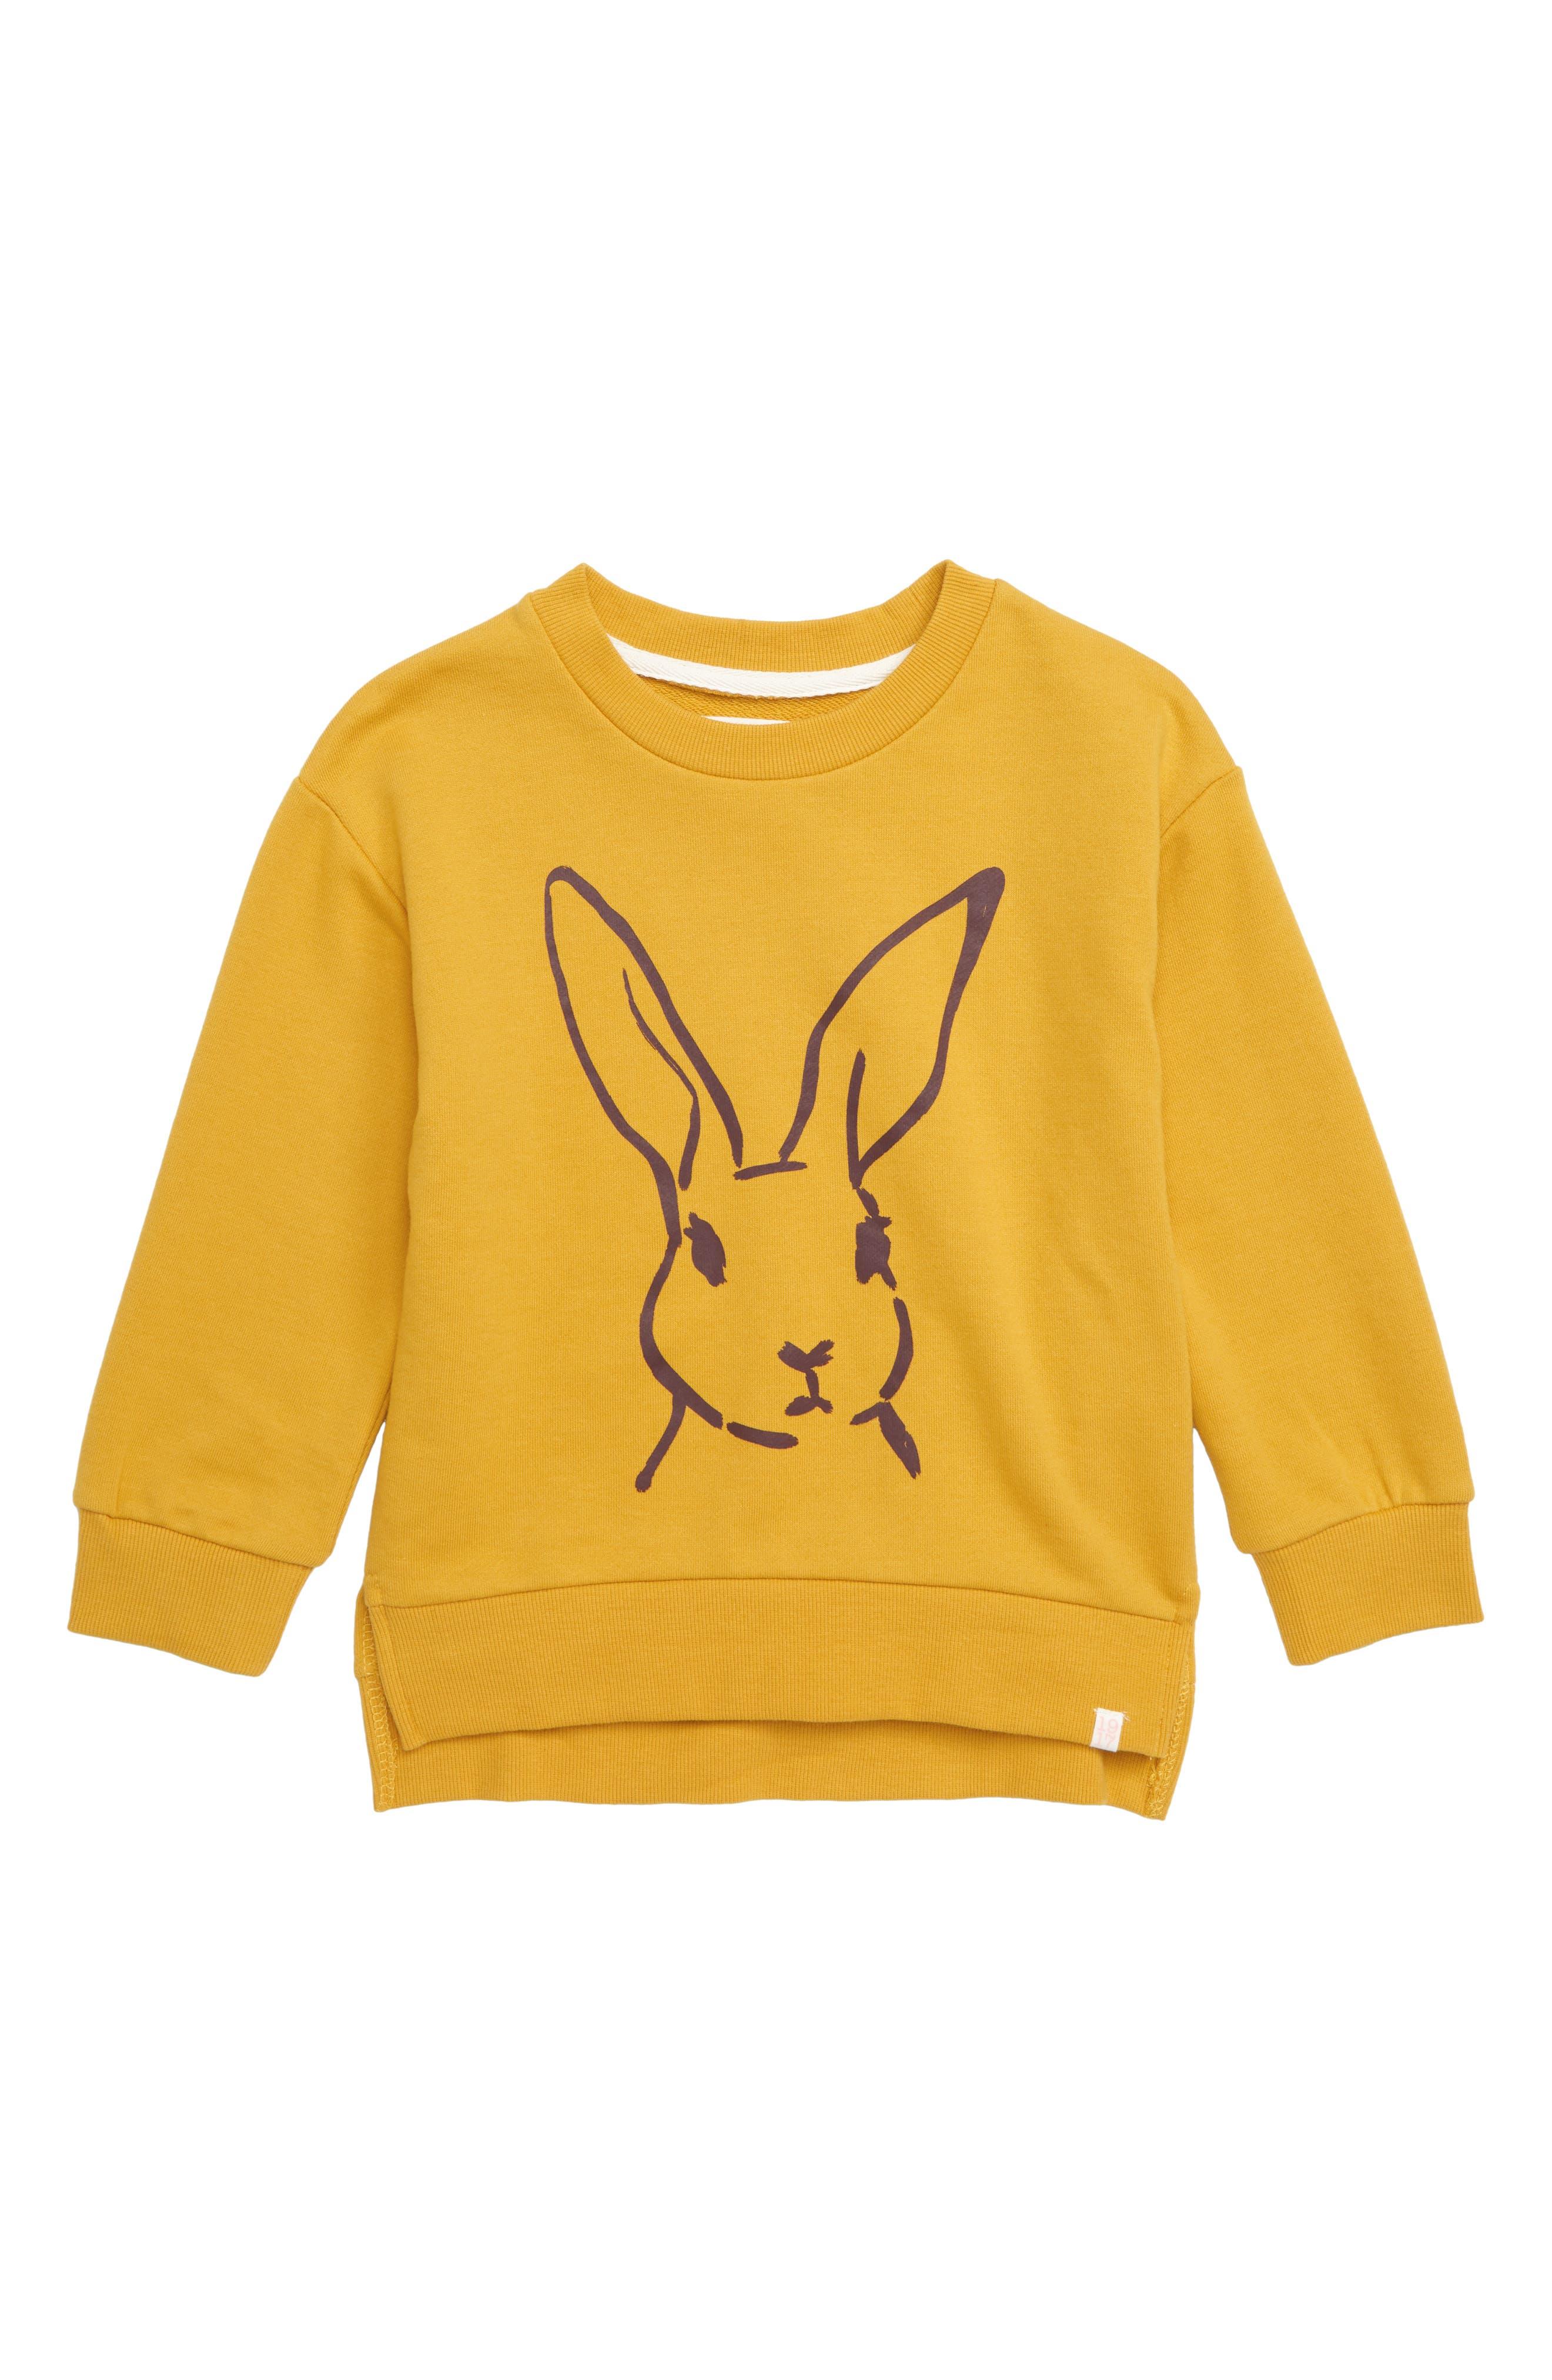 SOVEREIGN CODE Kennedy Bunny Graphic Sweatshirt, Main, color, BUNNY/ MARIGOLD